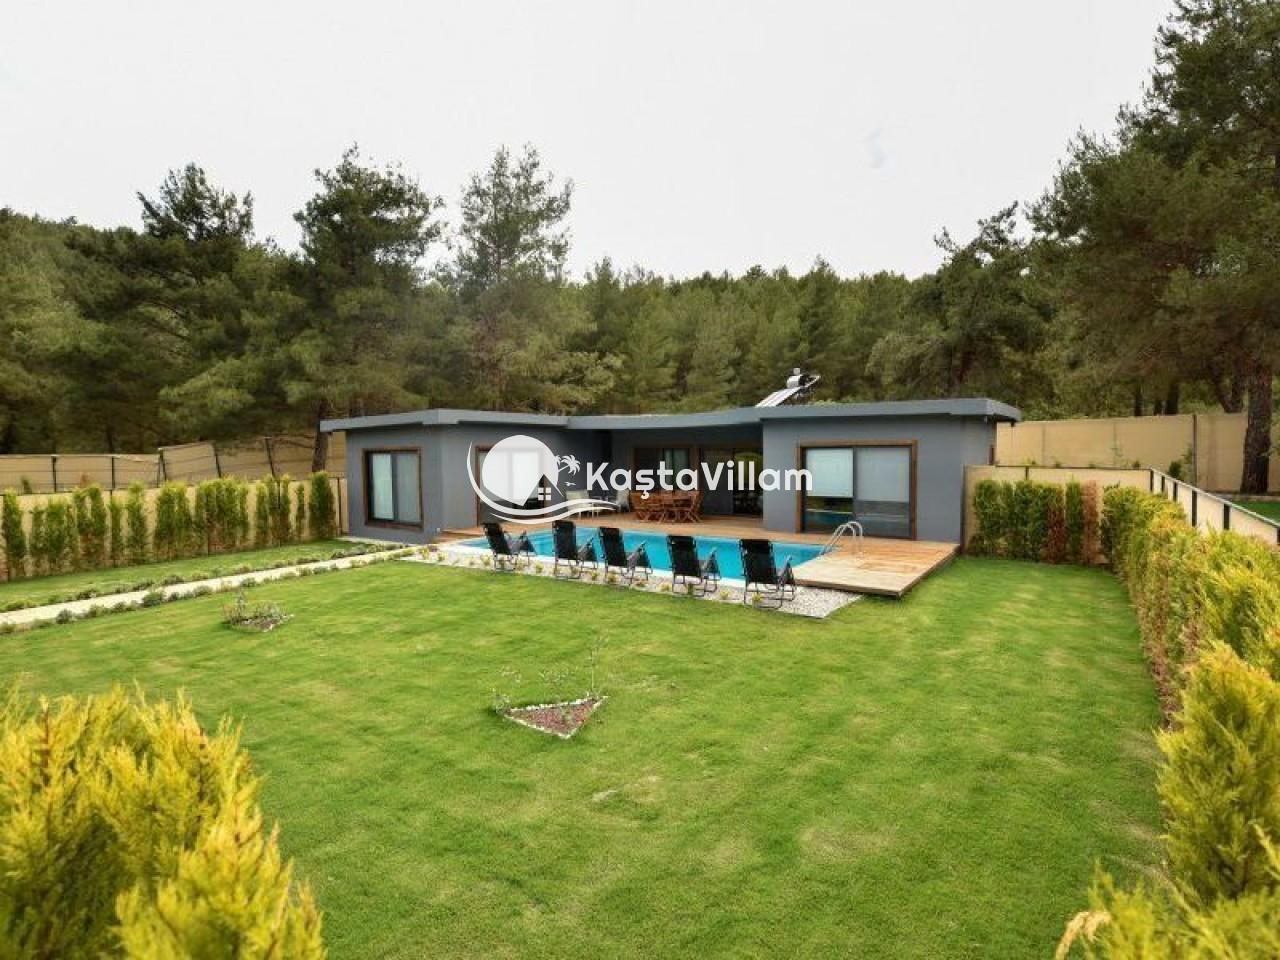 VİLLA GREEN   Kaş Kiralık Villa, Kaş Yazlık Villa - Kaştavillam